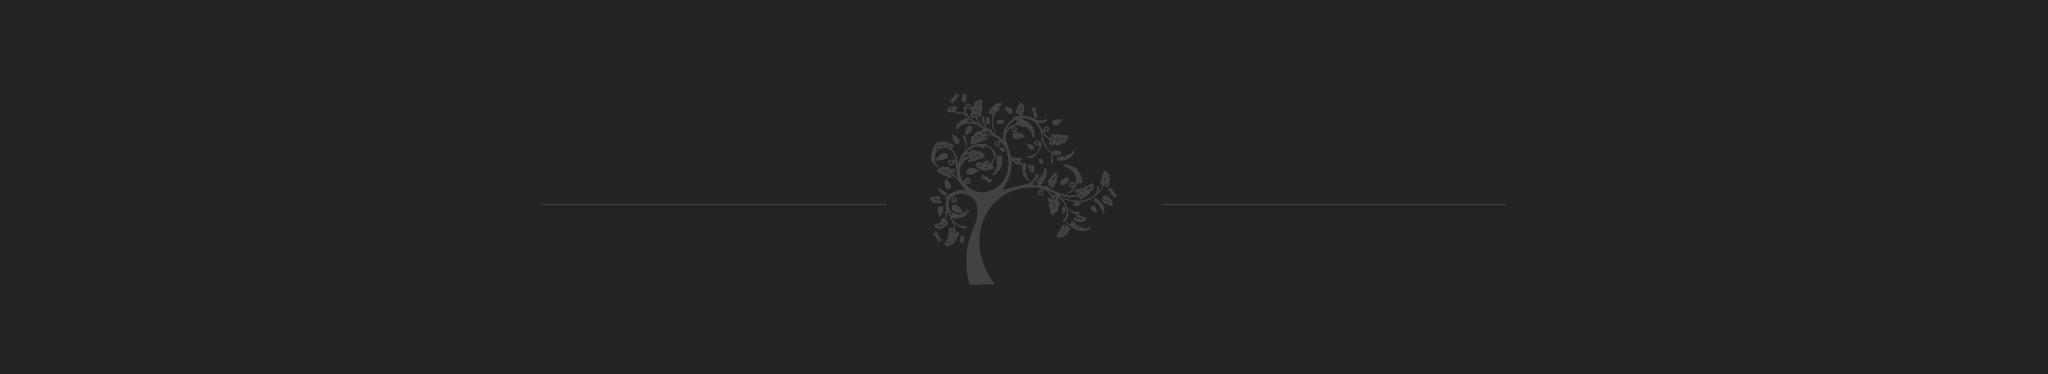 strom-2